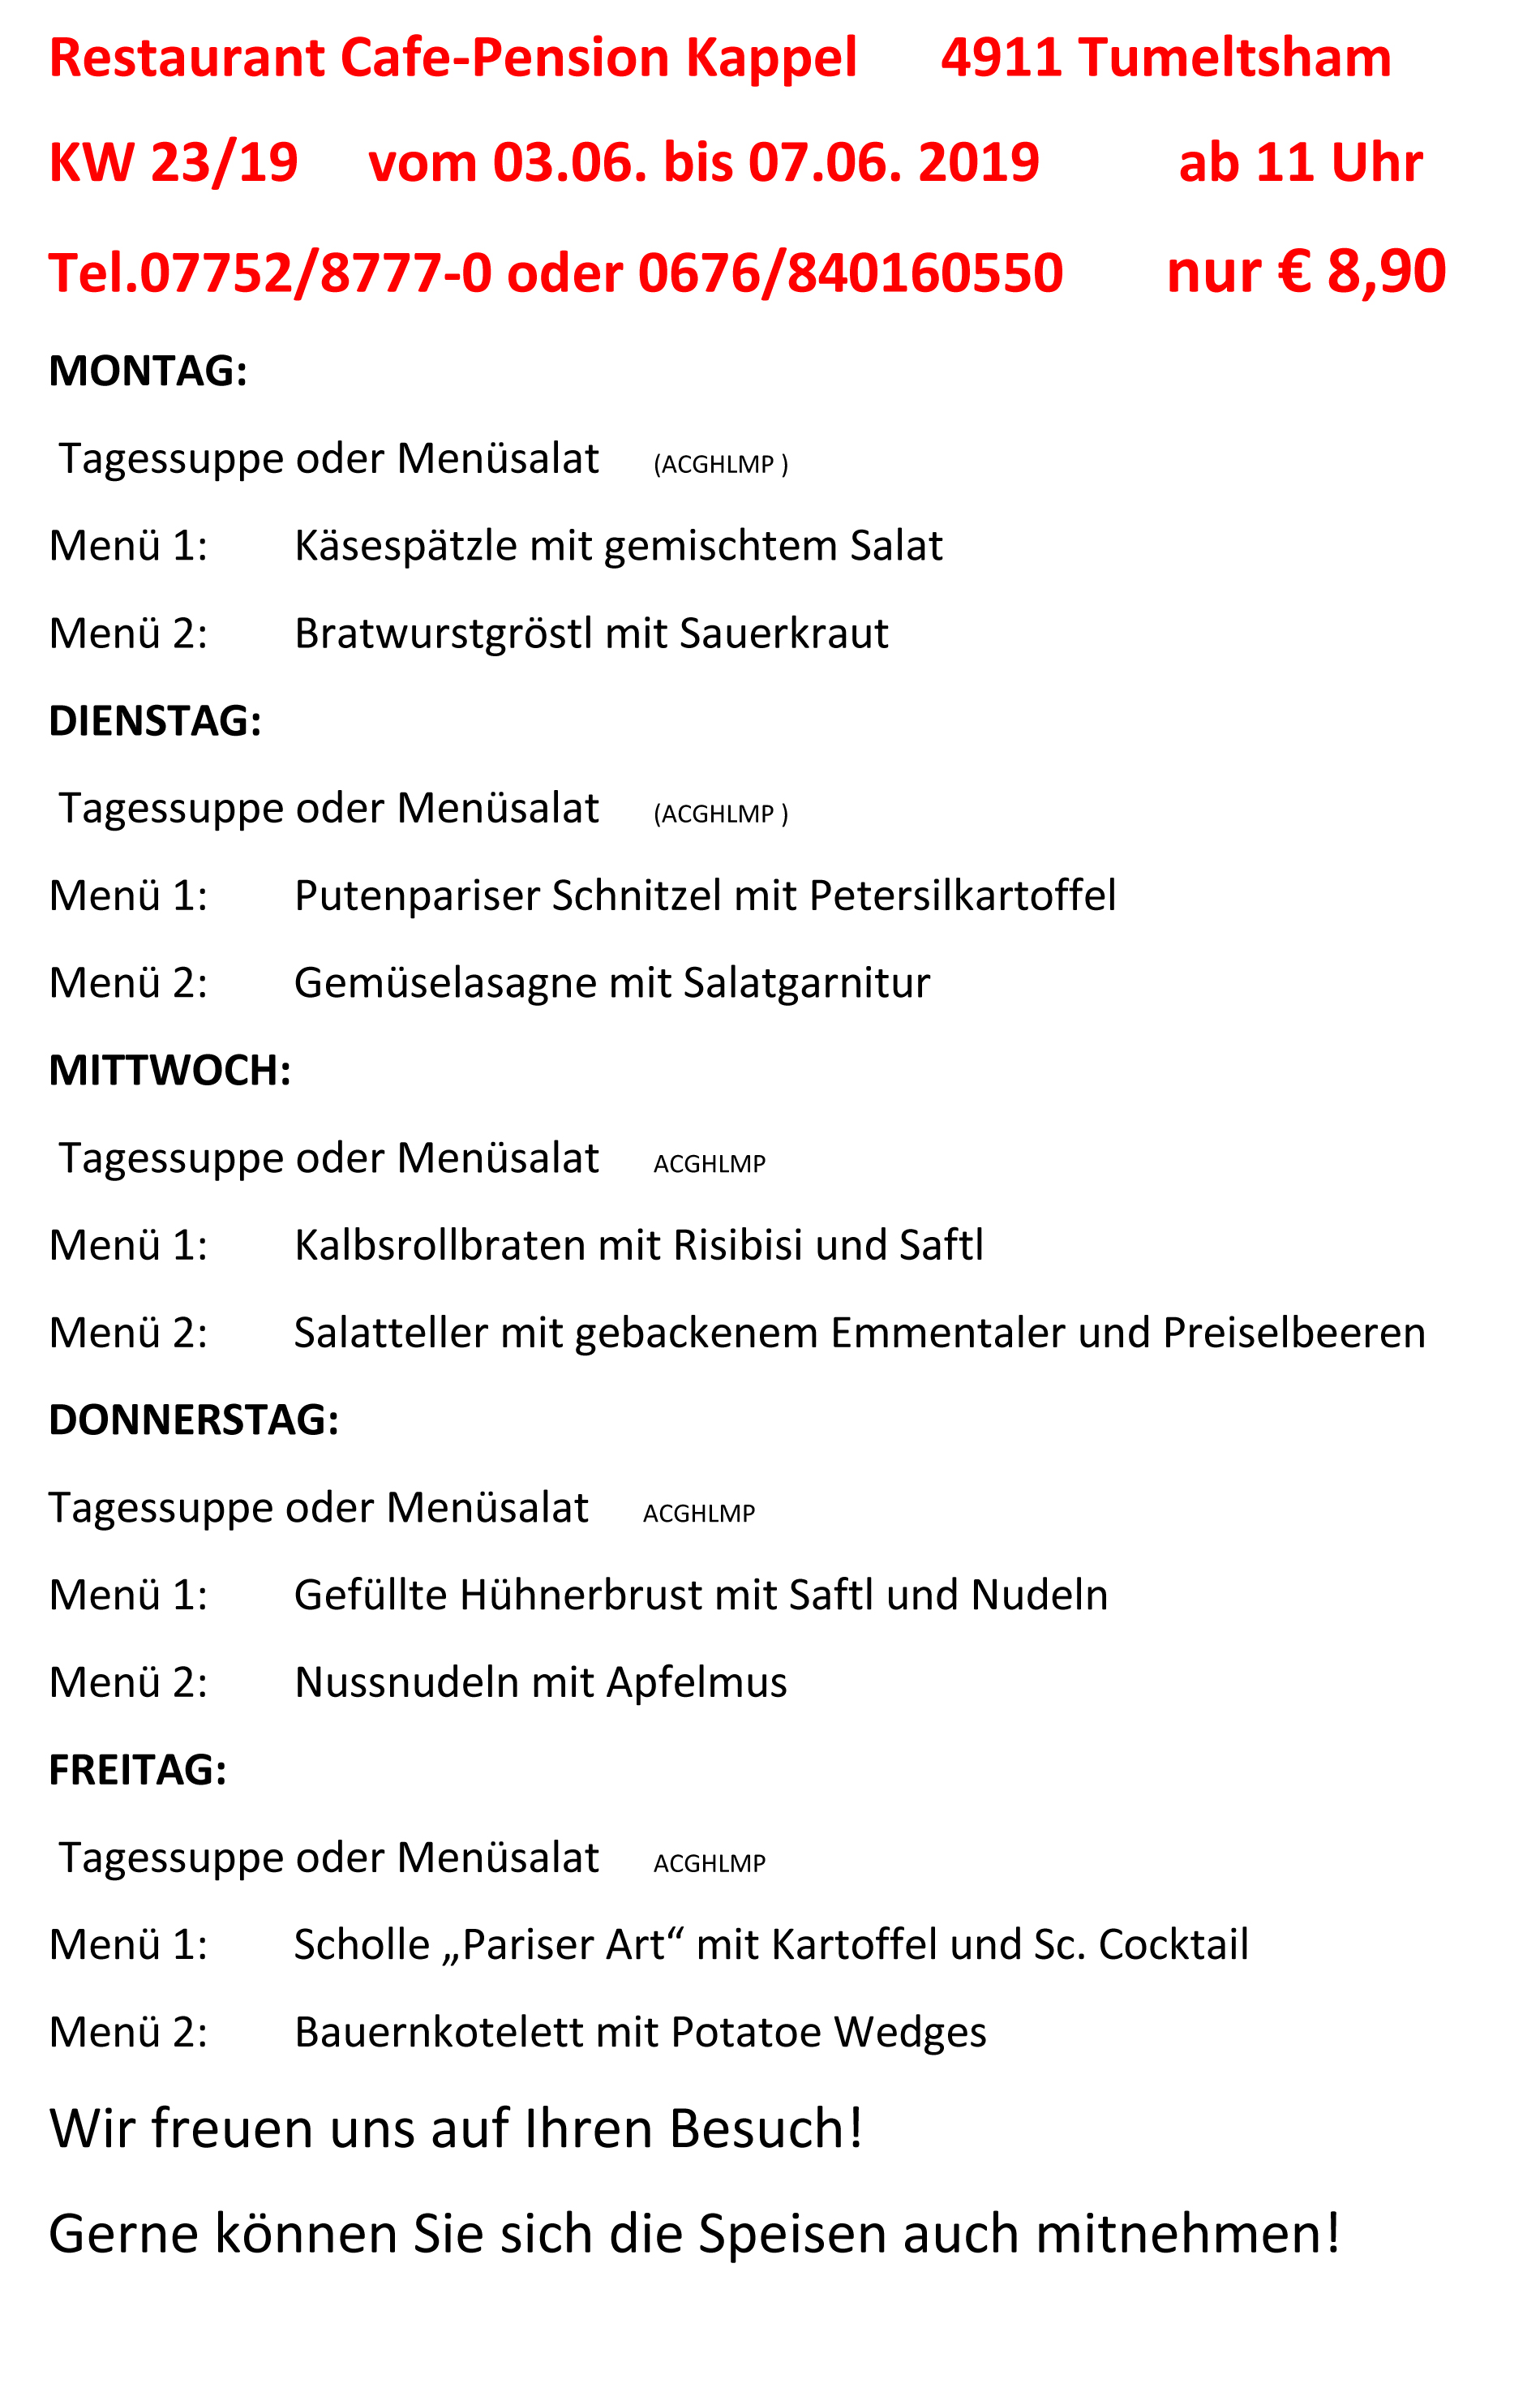 Menüplan KW 23-19 (1)